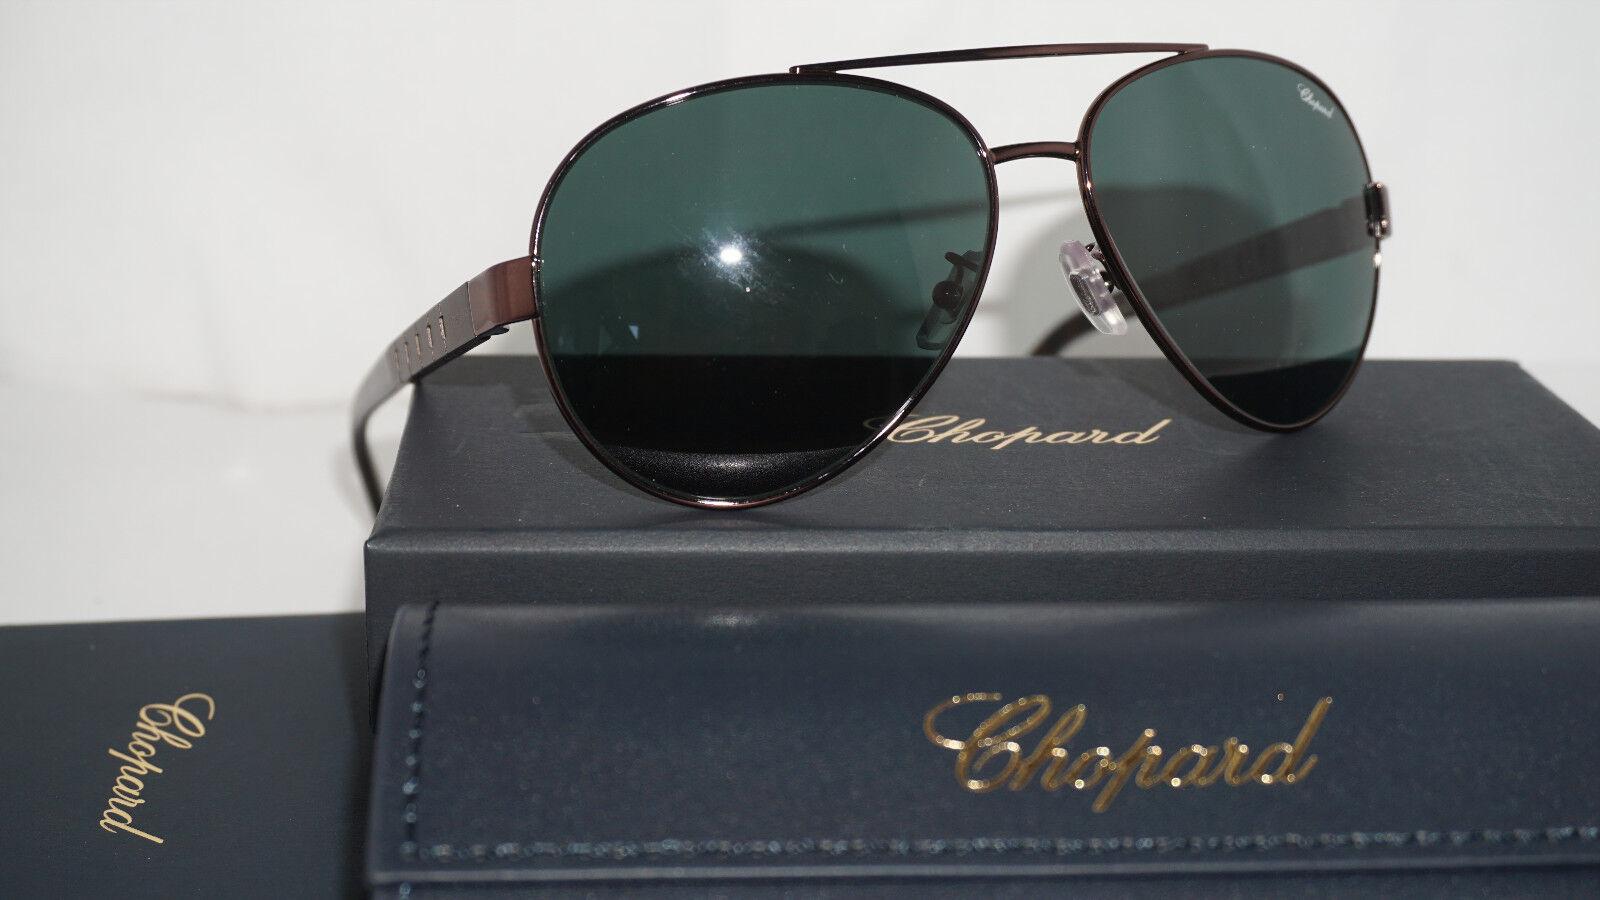 Chopard Sunglasses New Aviator Gunmetal Green Polarized SCHB12 K01P 60 14 135